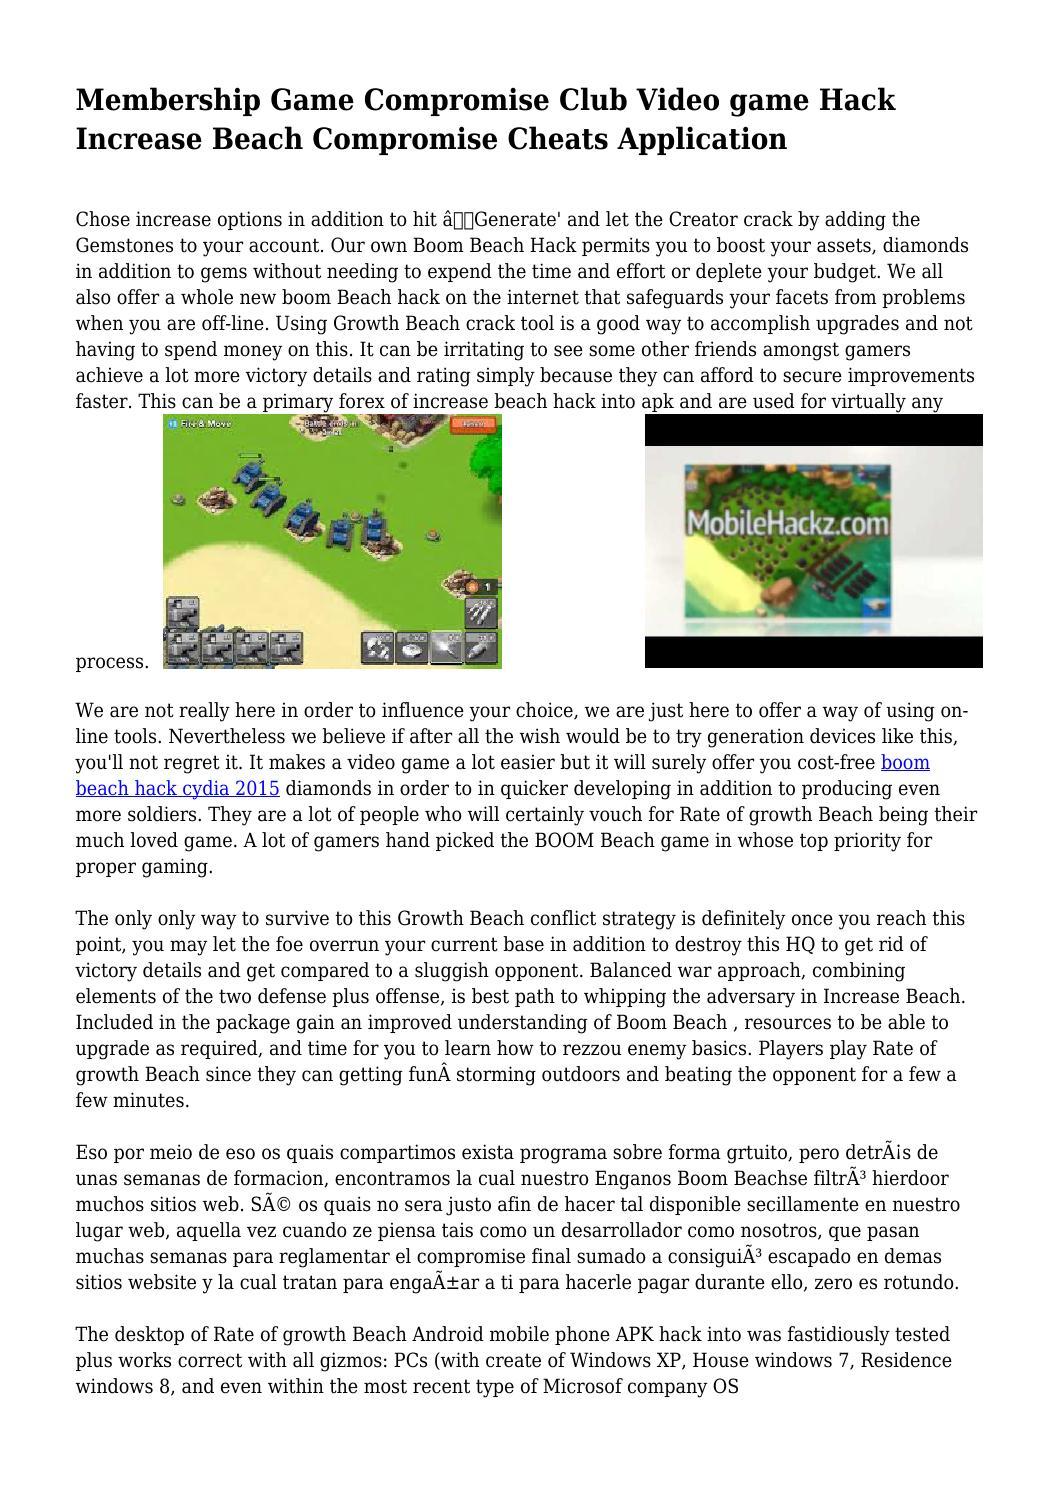 Membership Game Compromise Club Video game Hack Increase Beach